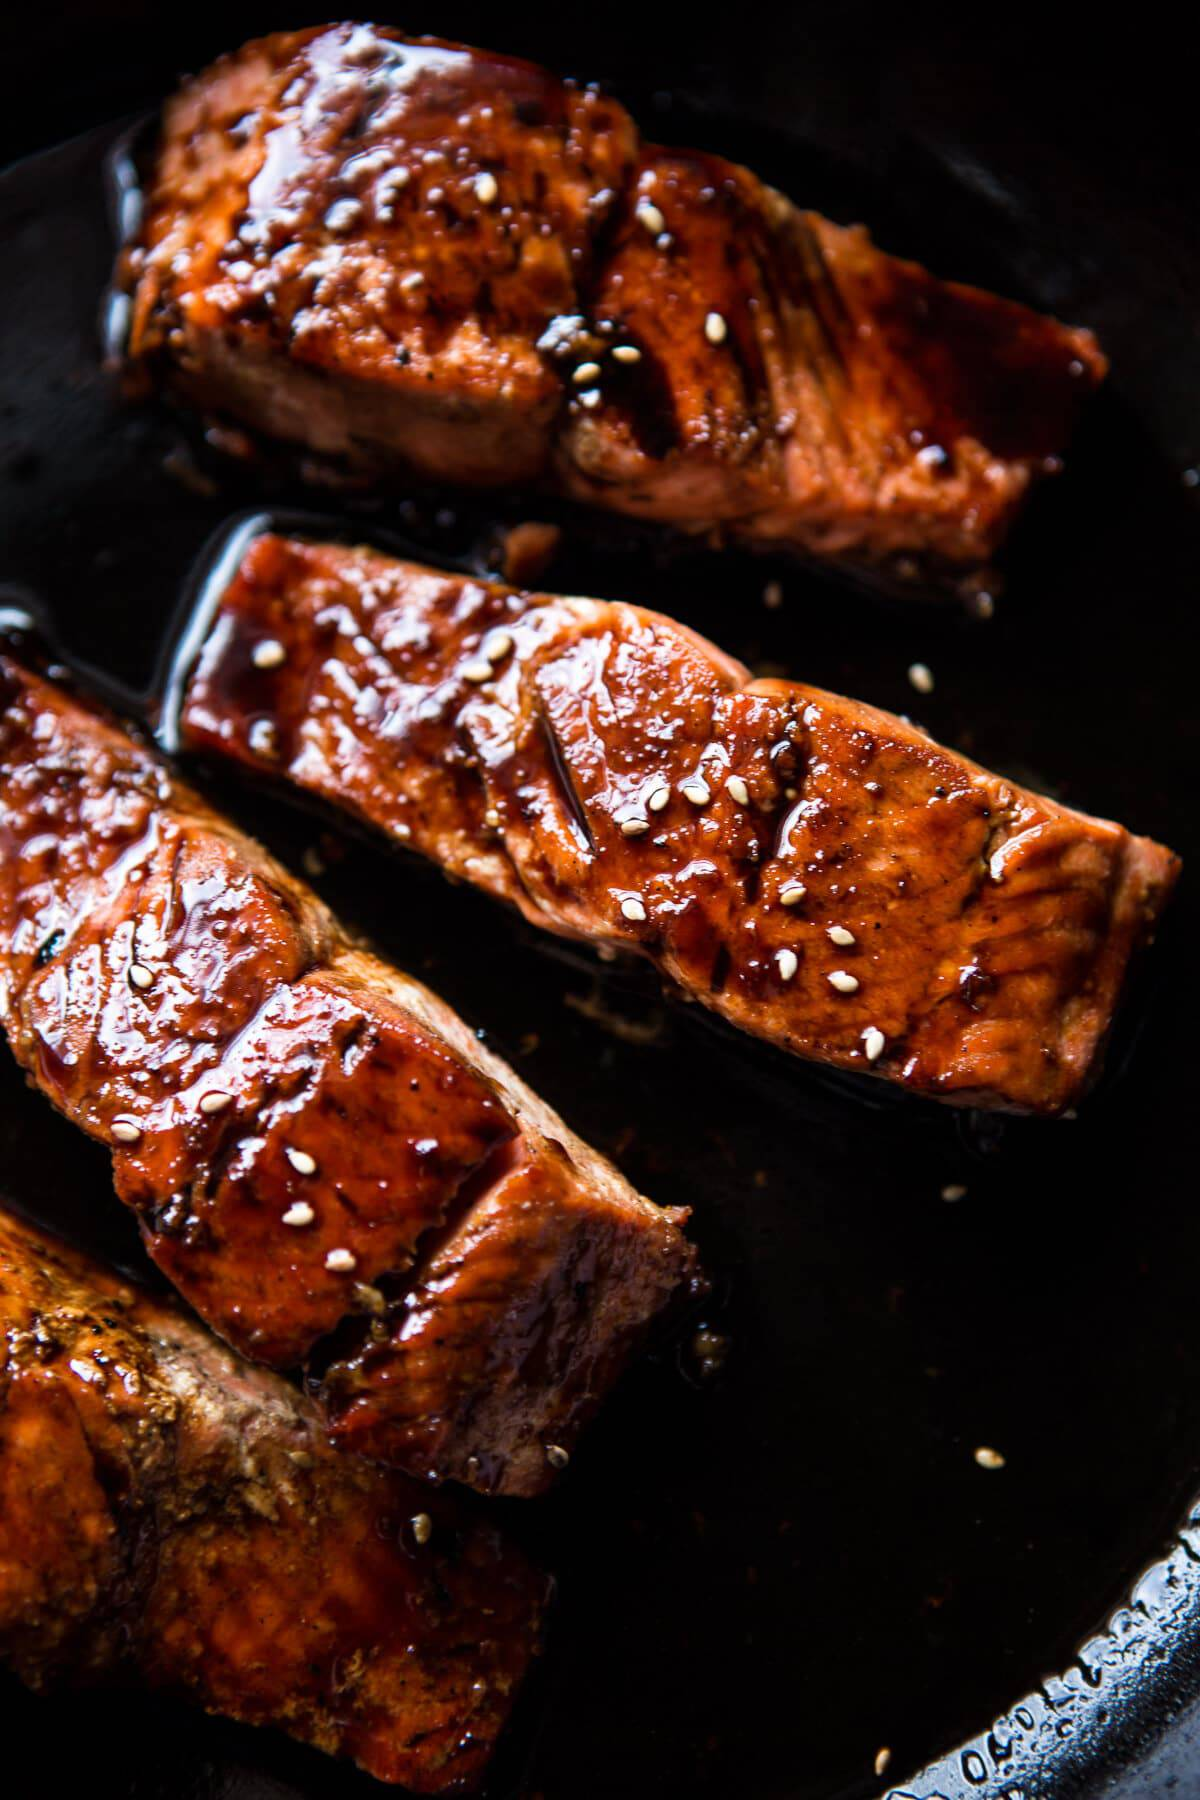 Caramelized Teriyaki Salmon with Sesame Toasted Buckwheat-2